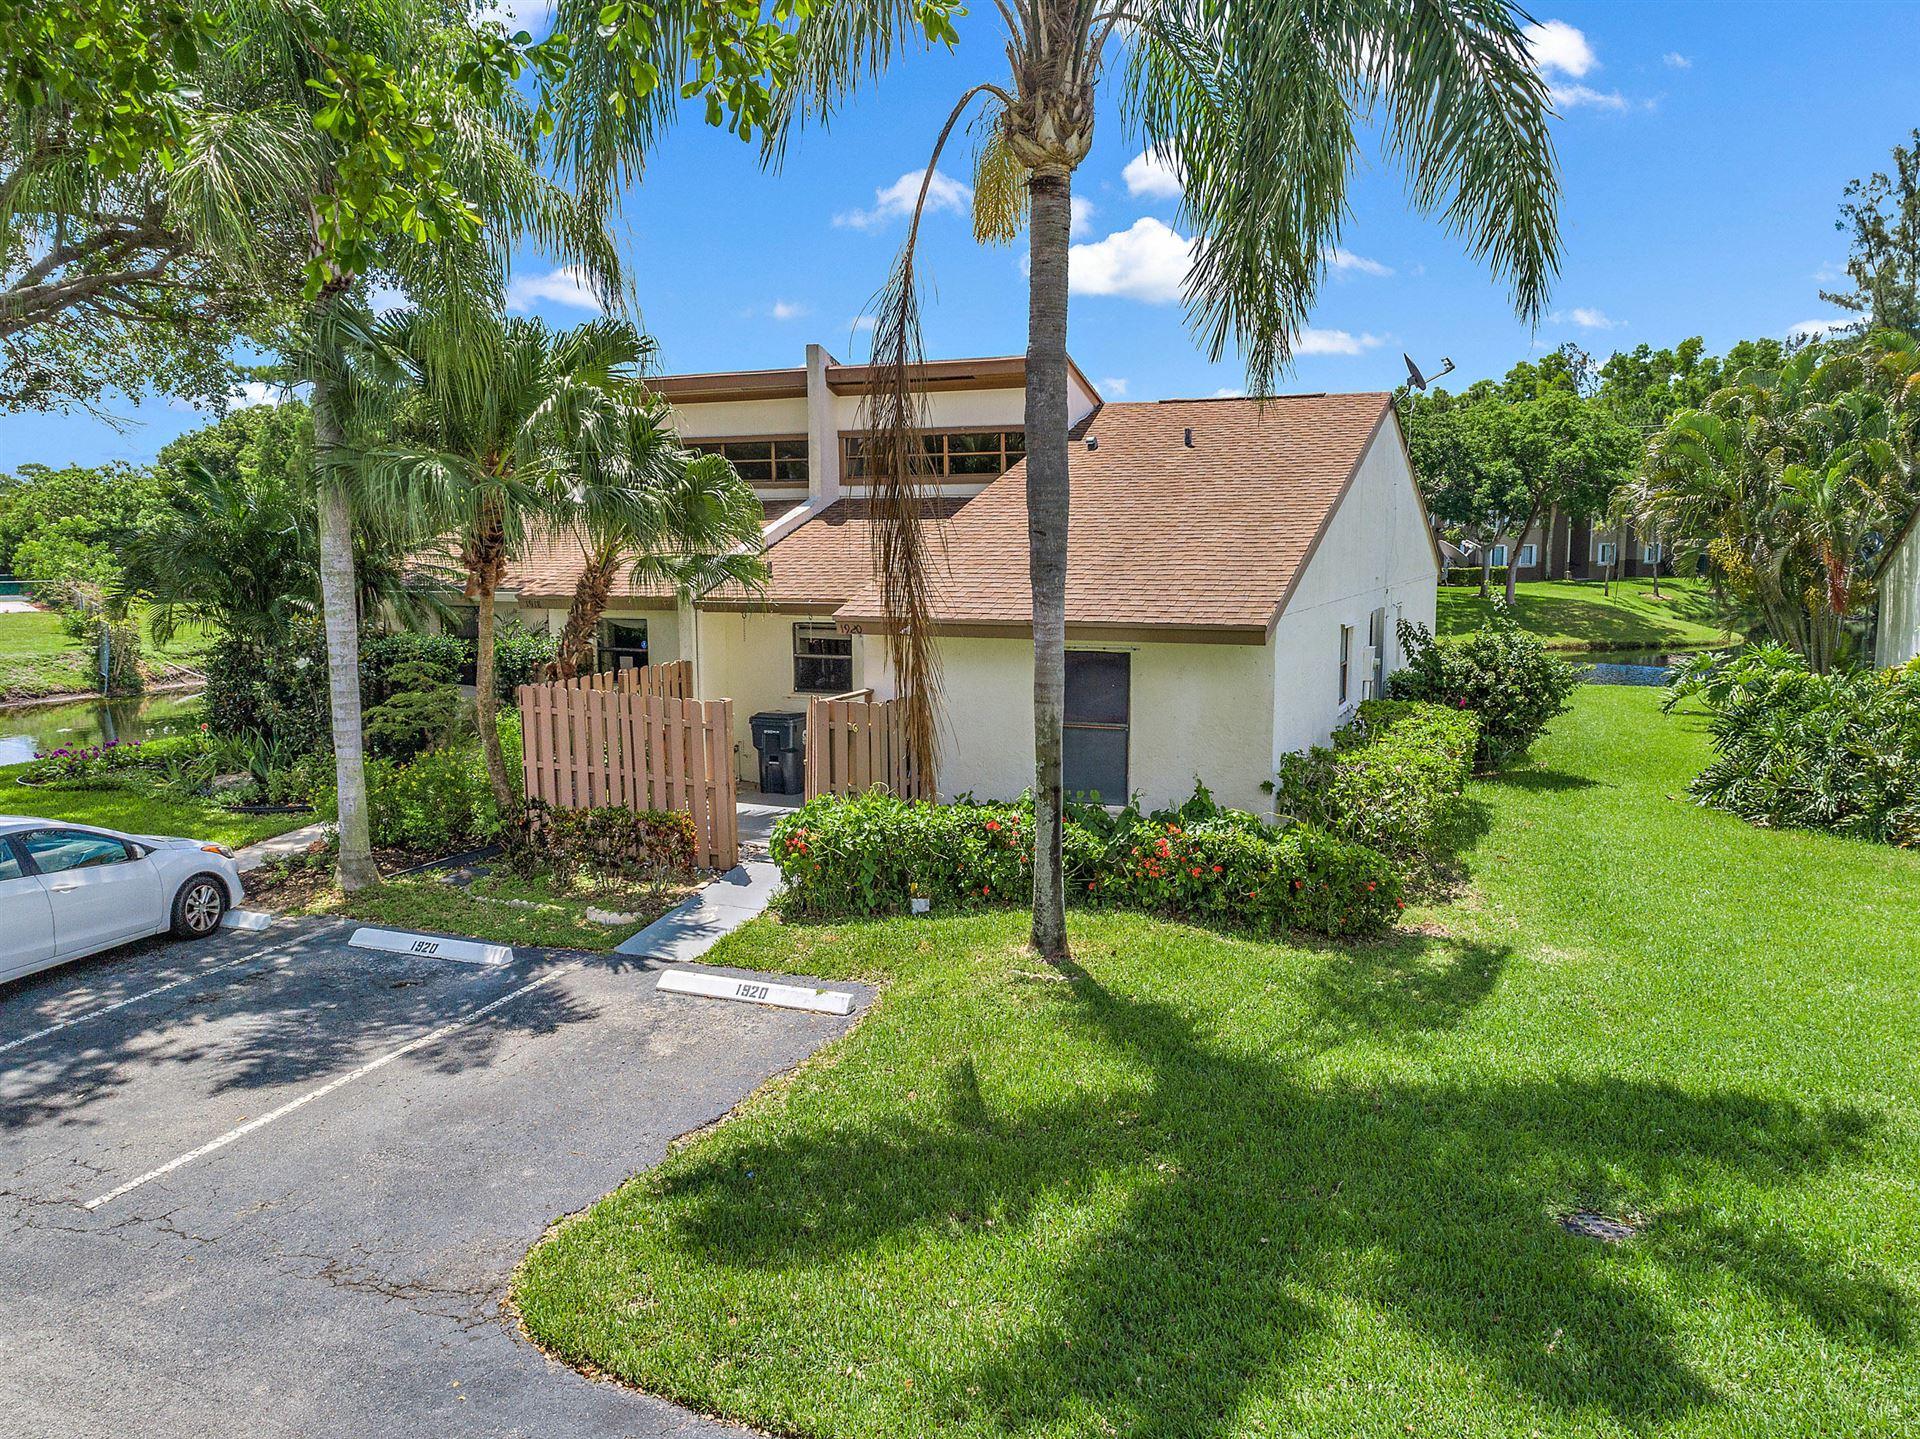 1920 Monks Court, West Palm Beach, FL 33415 - MLS#: RX-10733531